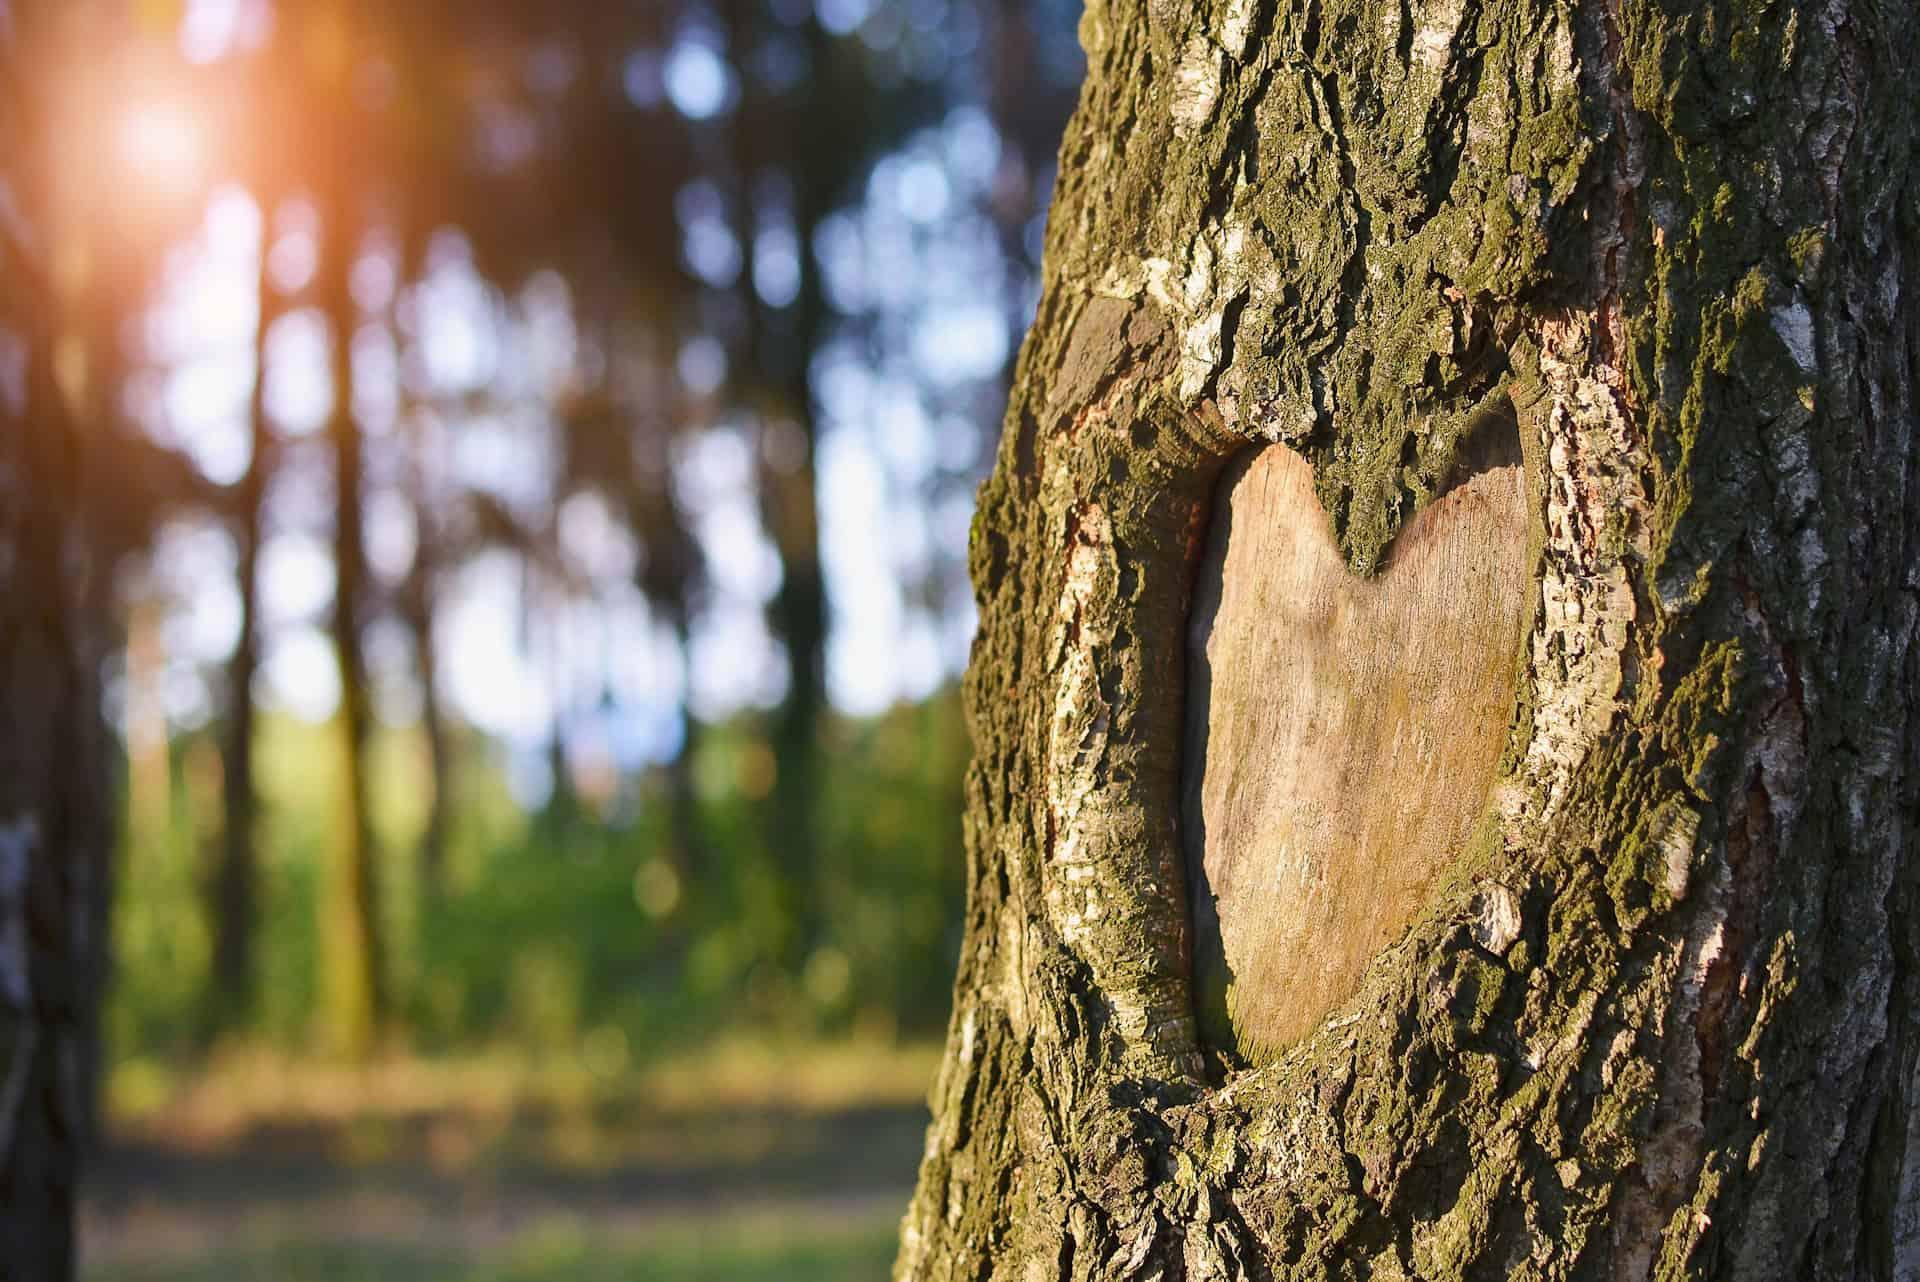 Serce w korze drzewa